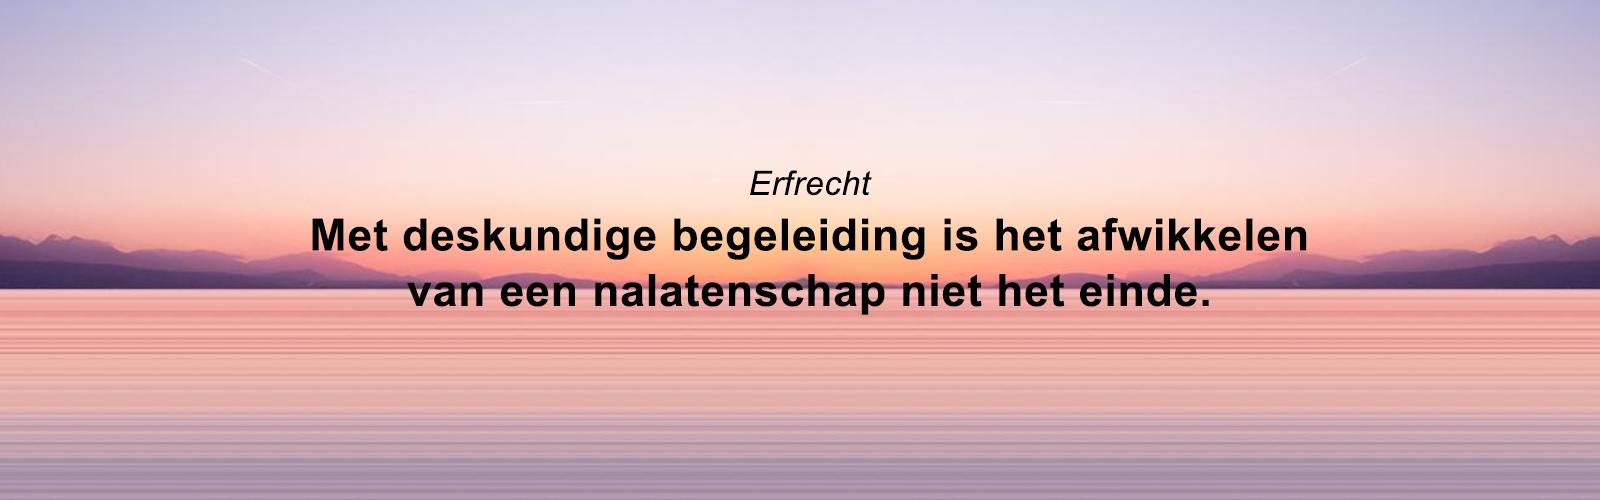 homepage-banner-erfrecht_new